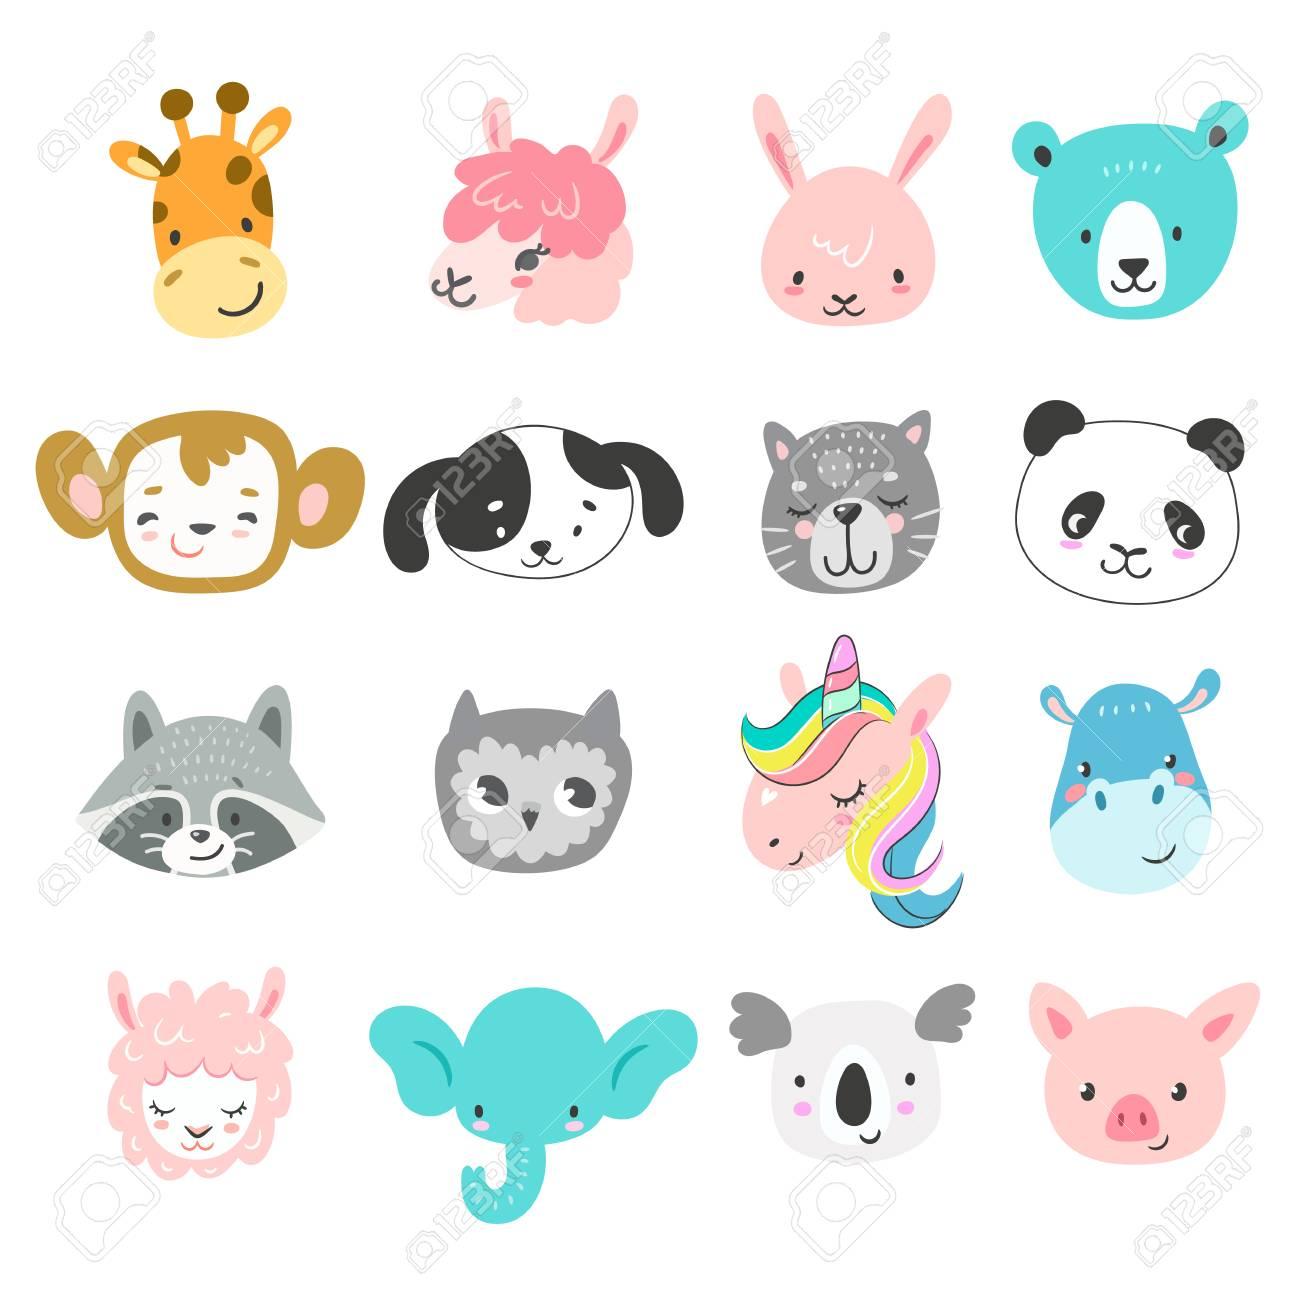 Set of cute hand drawn smiling animals characters. Cartoon zoo. Vector illustration. Giraffe, llama, bunny, bear, monkey, dog, cat, panda, raccoon, owl, unicorn, hippo, sheep, elephant, koala and pig - 93563284